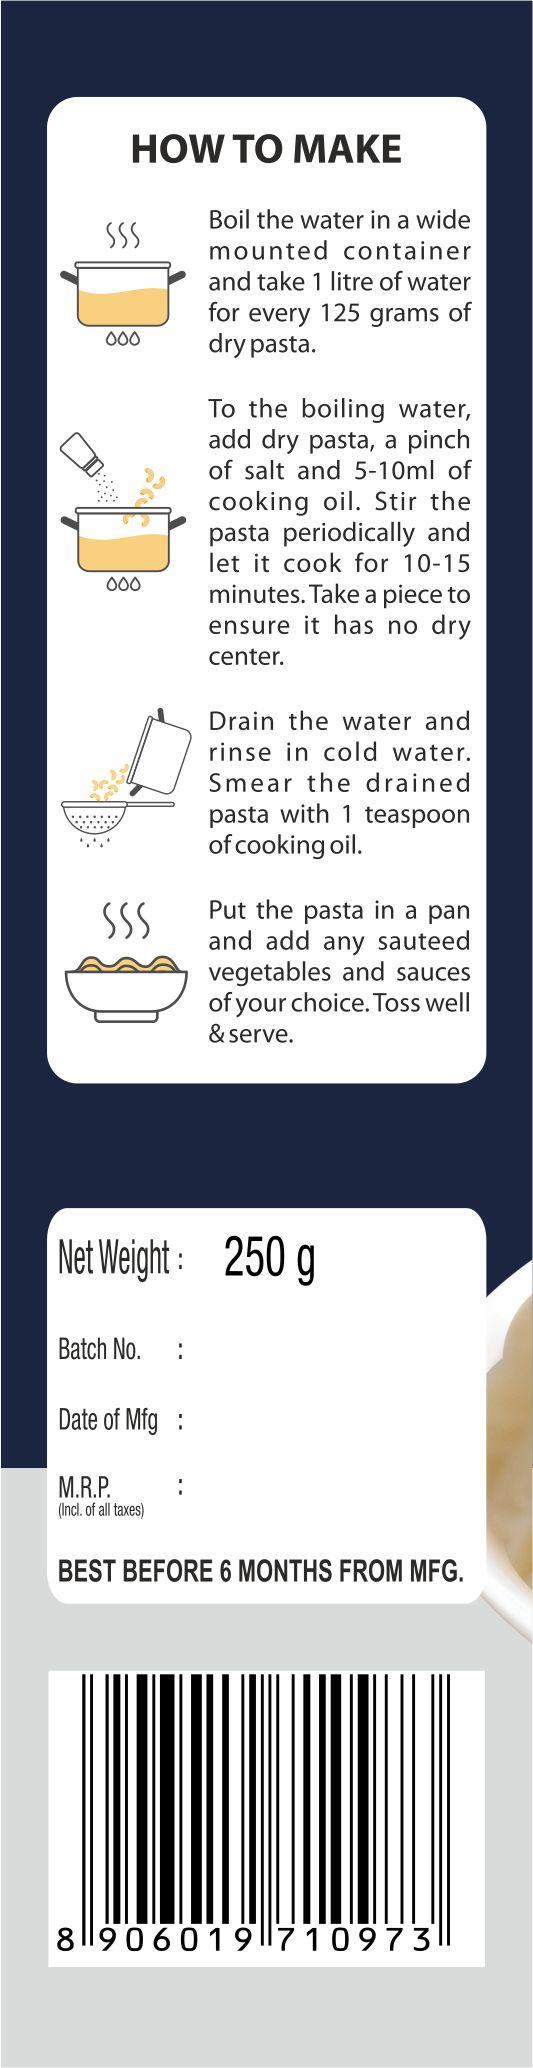 Wheafree Gluten Free Rice Pasta, Wheafree Rice Pasta, Rice Pasta, Gluten Free Rice Pasta, Gluten Free, Wheafree